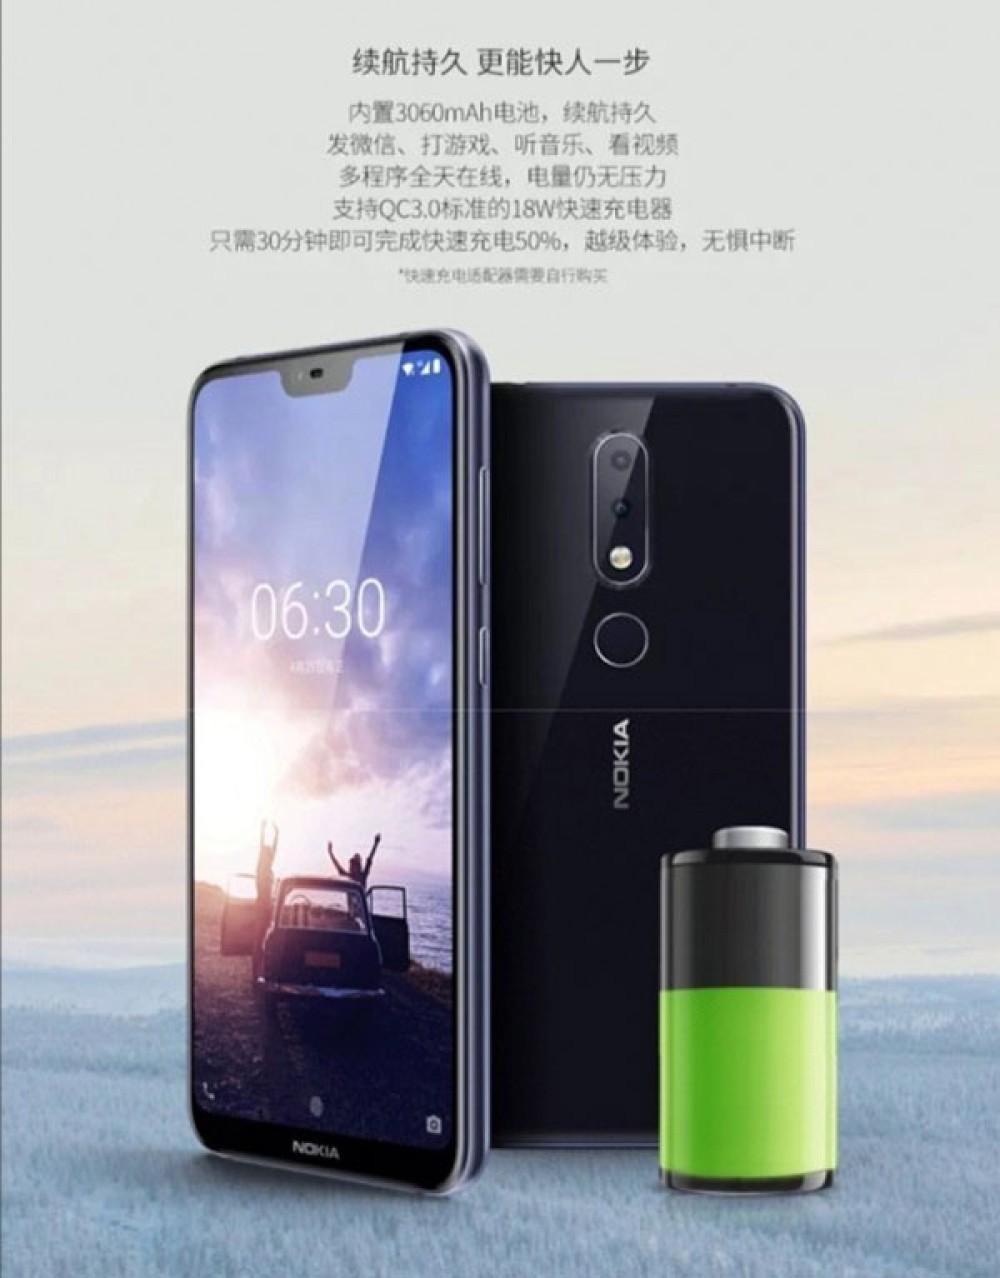 Nokia X6: Παρουσιάζεται αύριο με οθόνη 5.8'' FHD+, Snapdragon 636, dual κάμερα, Android 8.1 Oreo και τιμή από €200